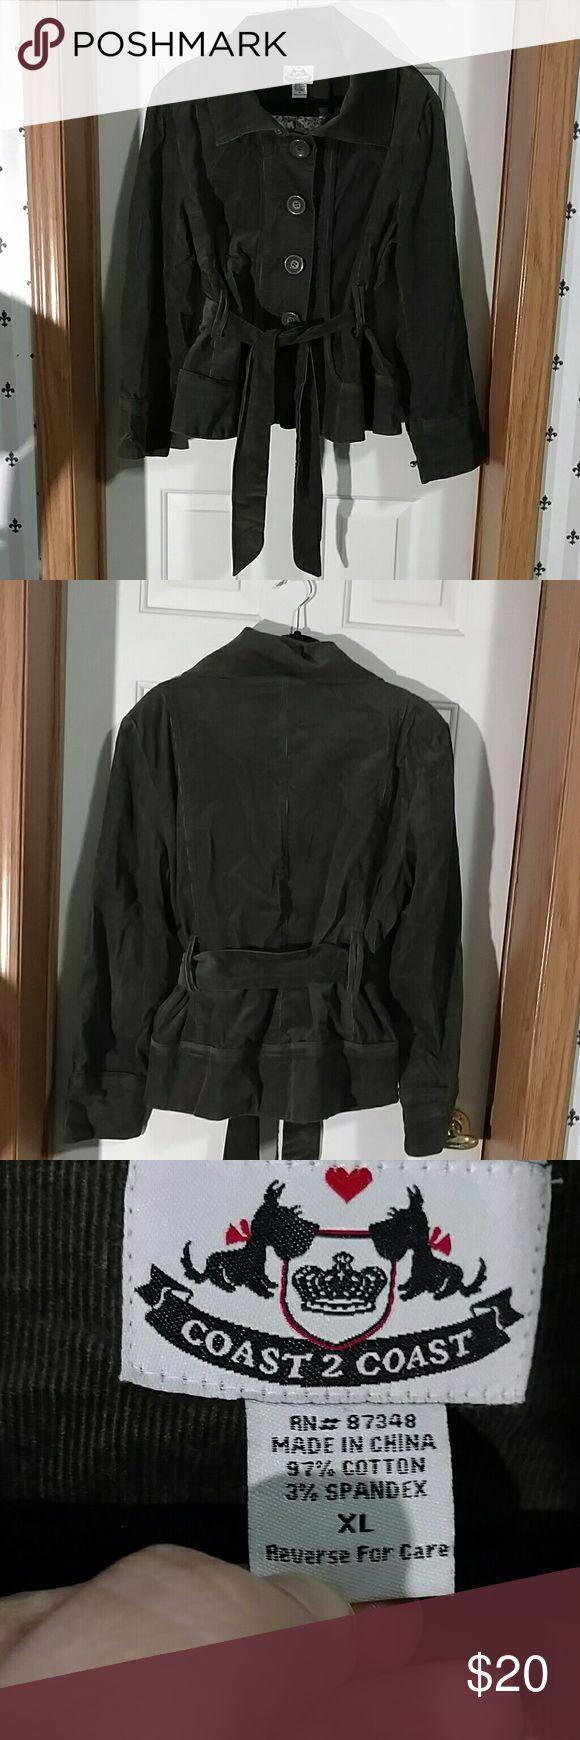 Coast 2 Coast corduroy jacket Beautiful Olive Green Corduroy Jacket. Big buttons. Tailored type fit. Gorgeous lining.  It is eye catching! Coast 2 Coast Jackets & Coats Pea Coats